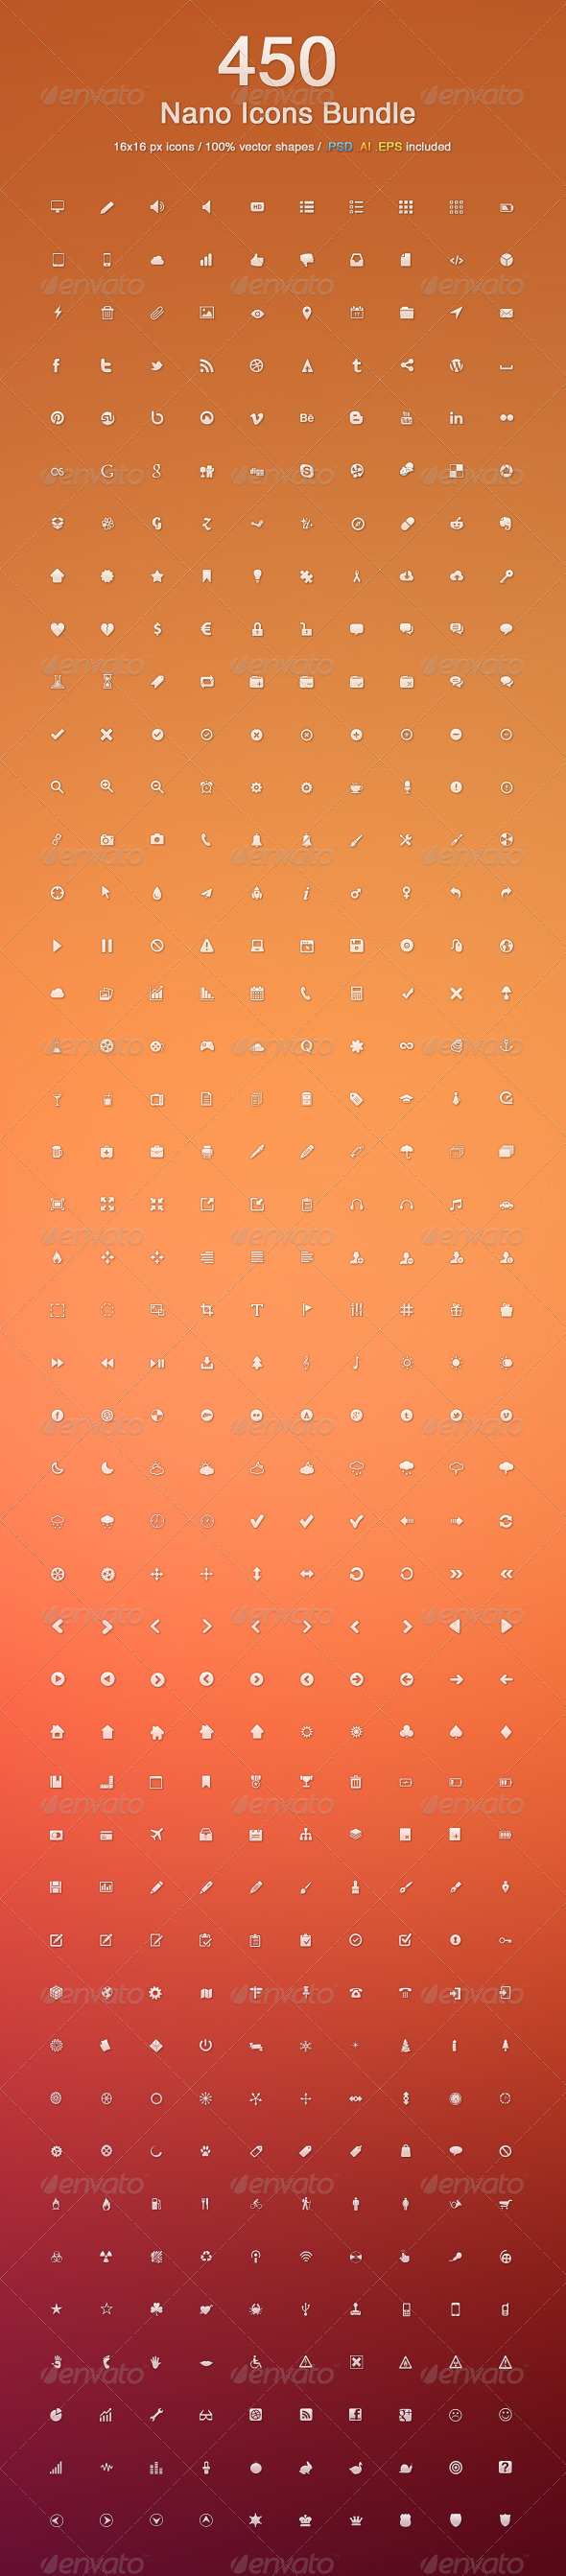 450 Nano Icons Bundle - Web Icons